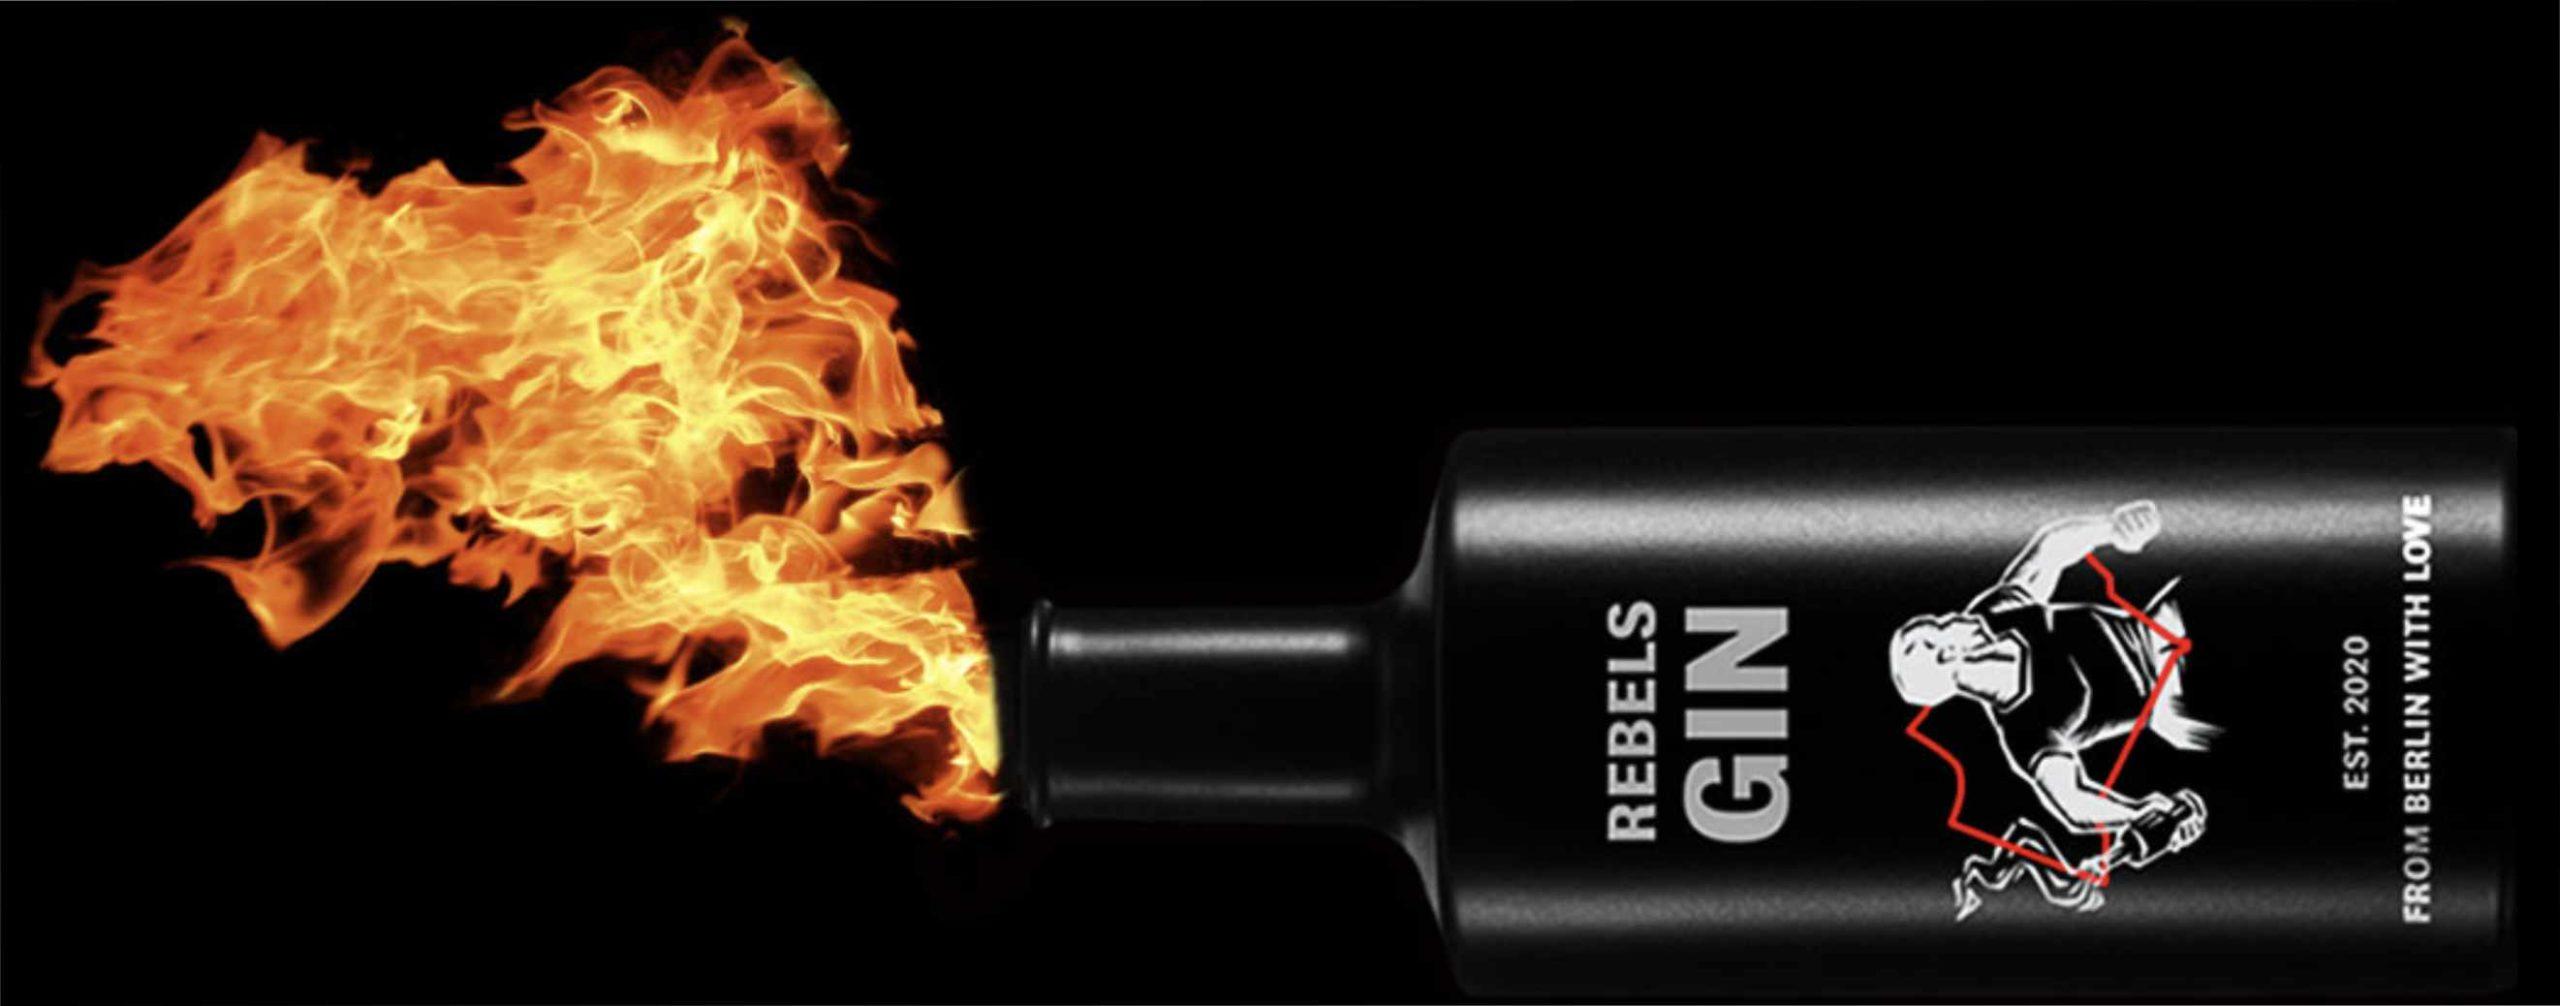 Werbung Rebels Gin